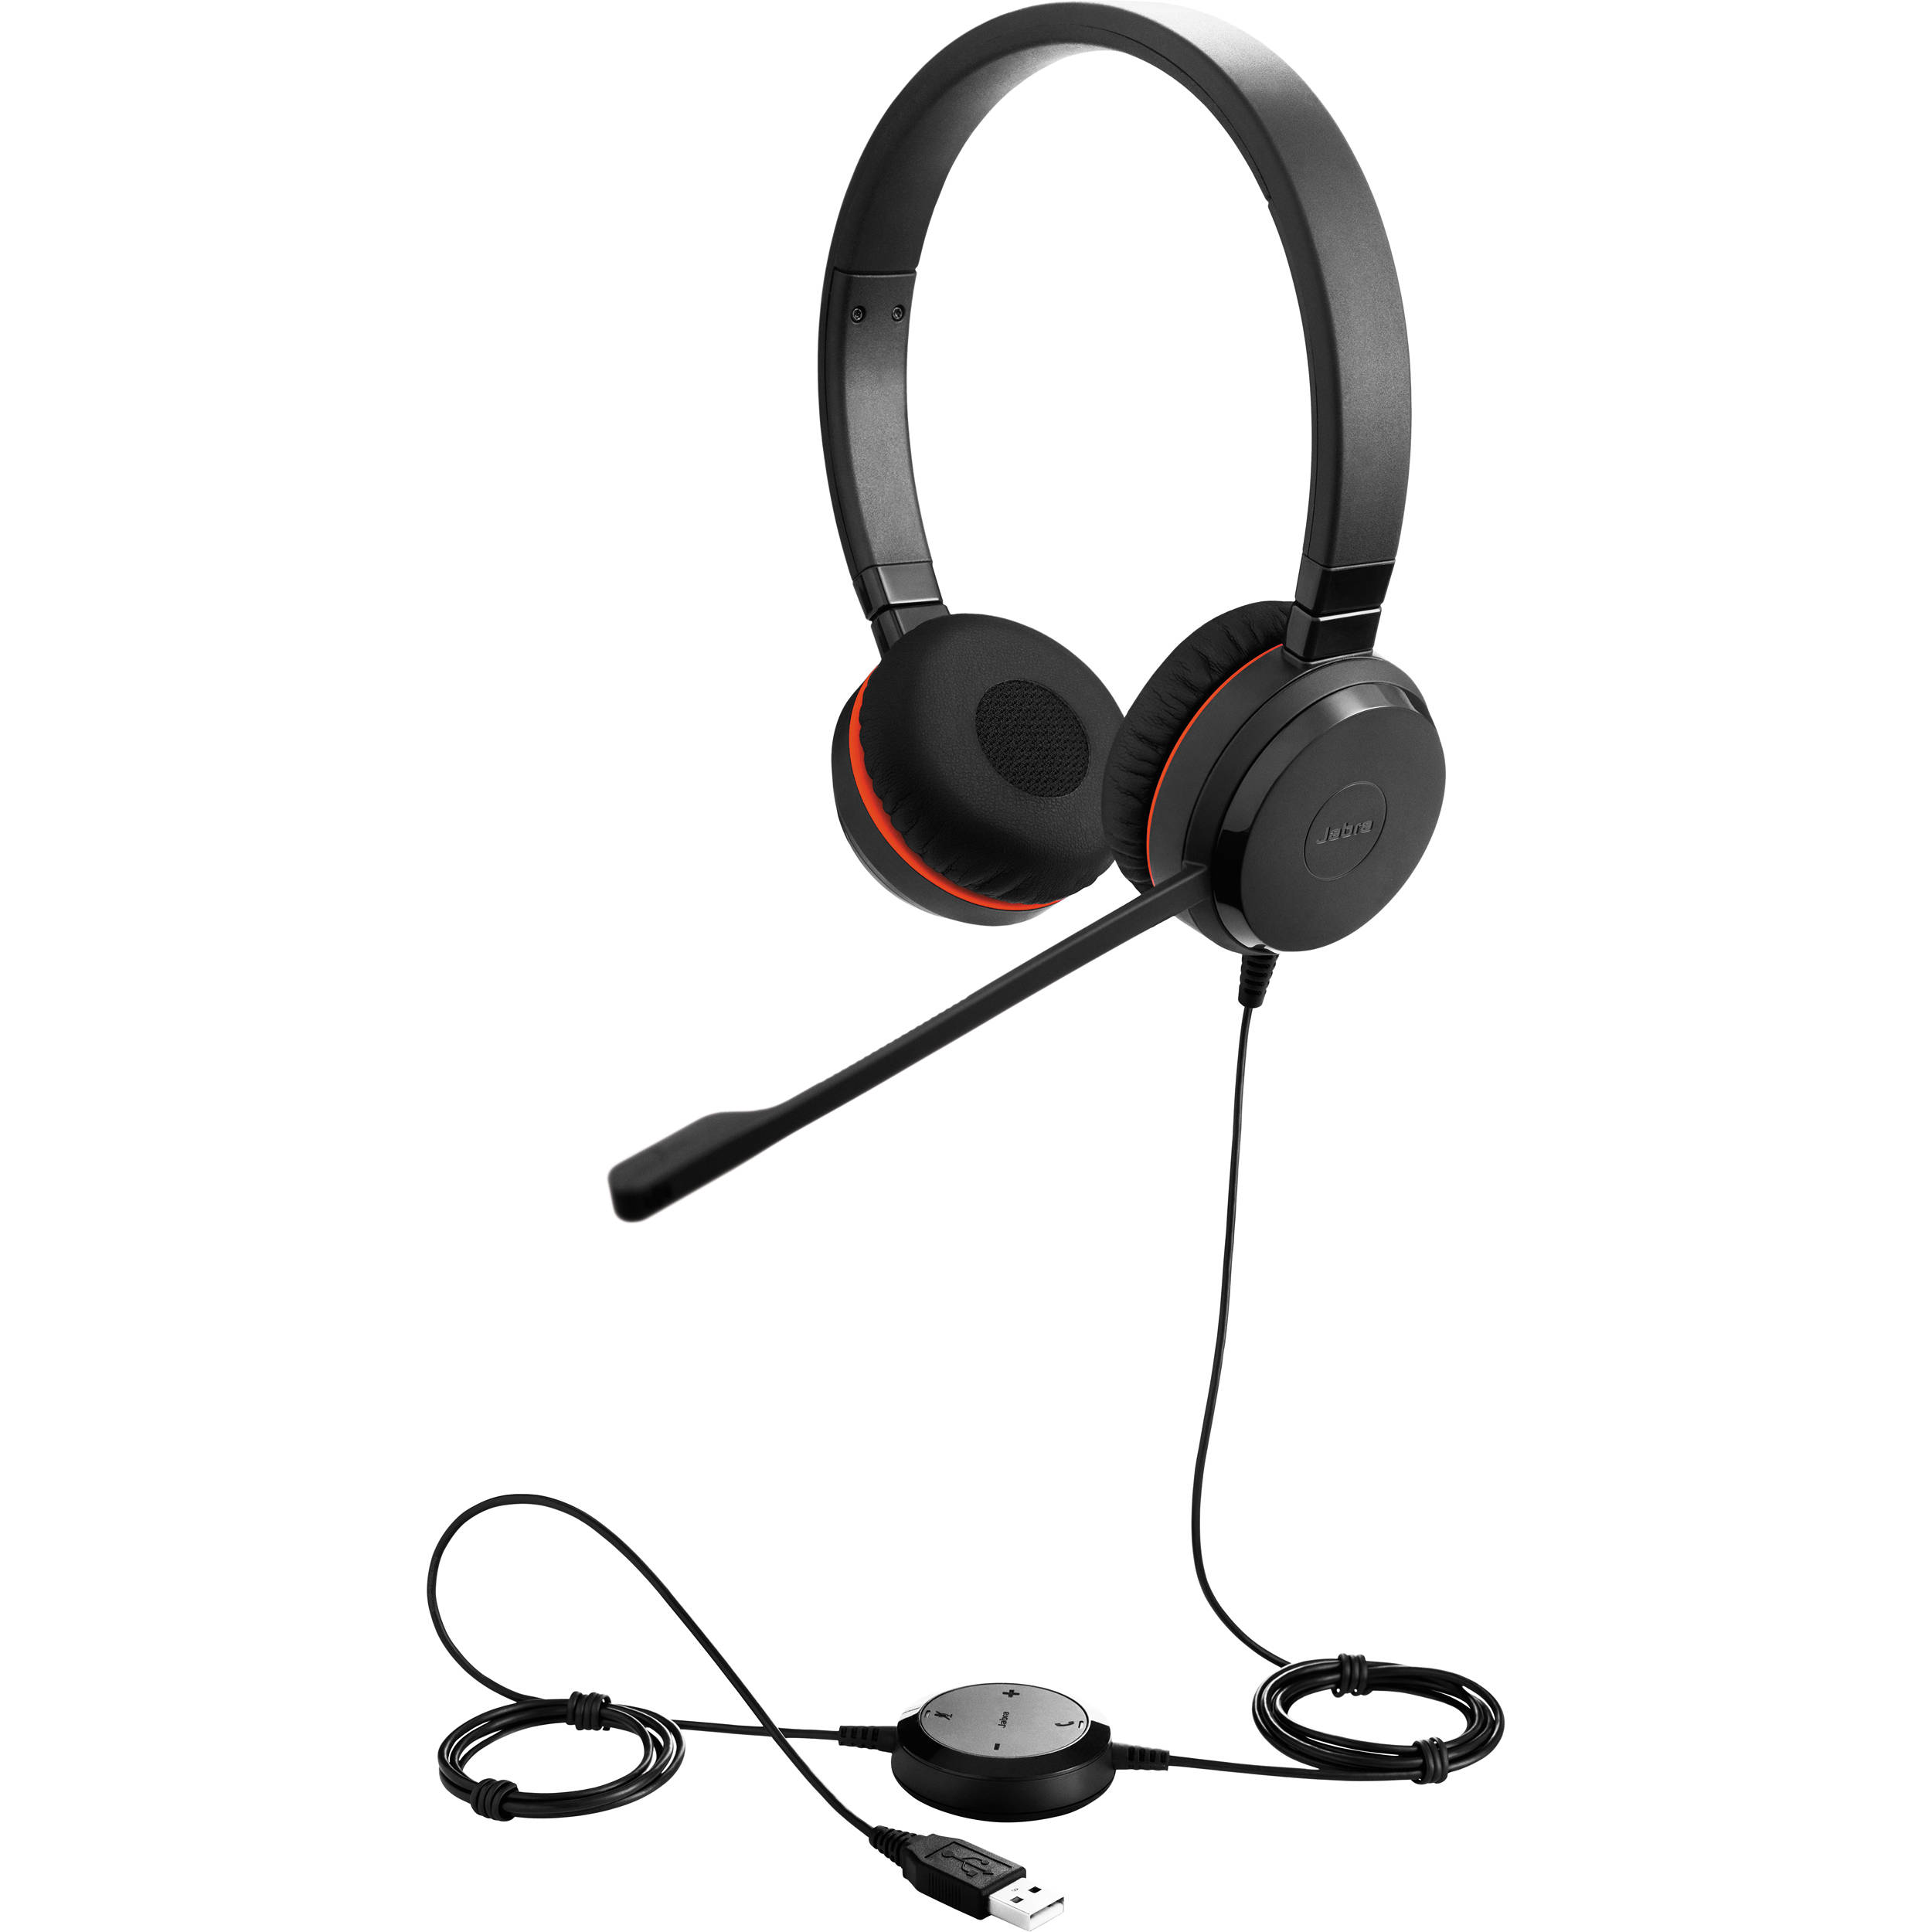 Jabra Evolve 75 Ms Stereo: Jabra EVOLVE 30 MS Stereo Headset 5399-823-109 B&H Photo Video